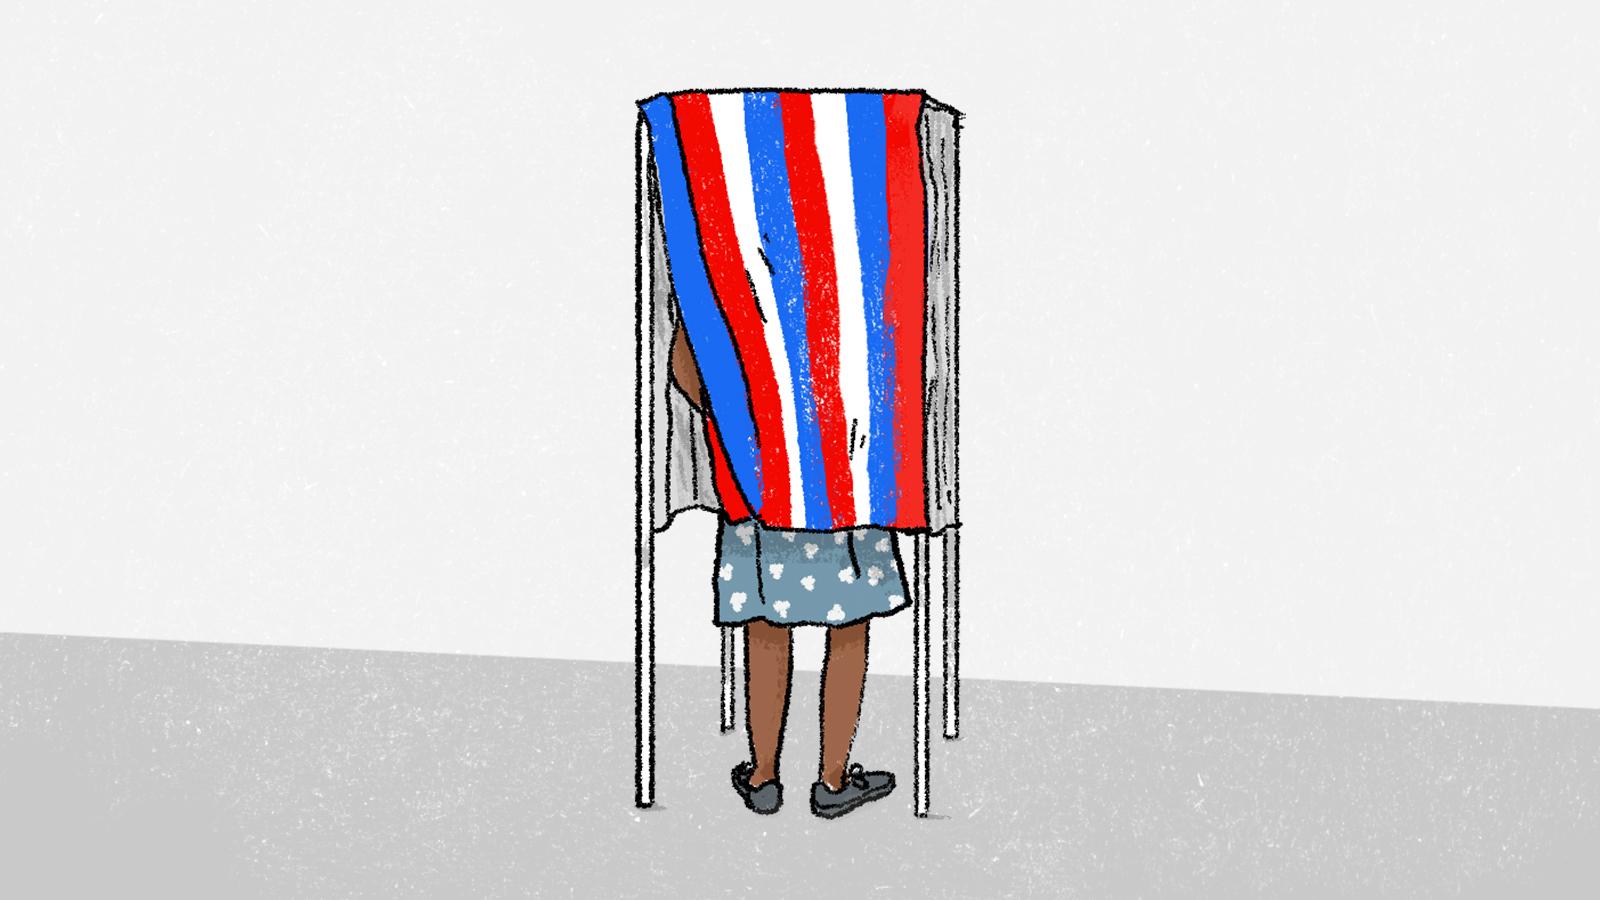 Voter registration, explained